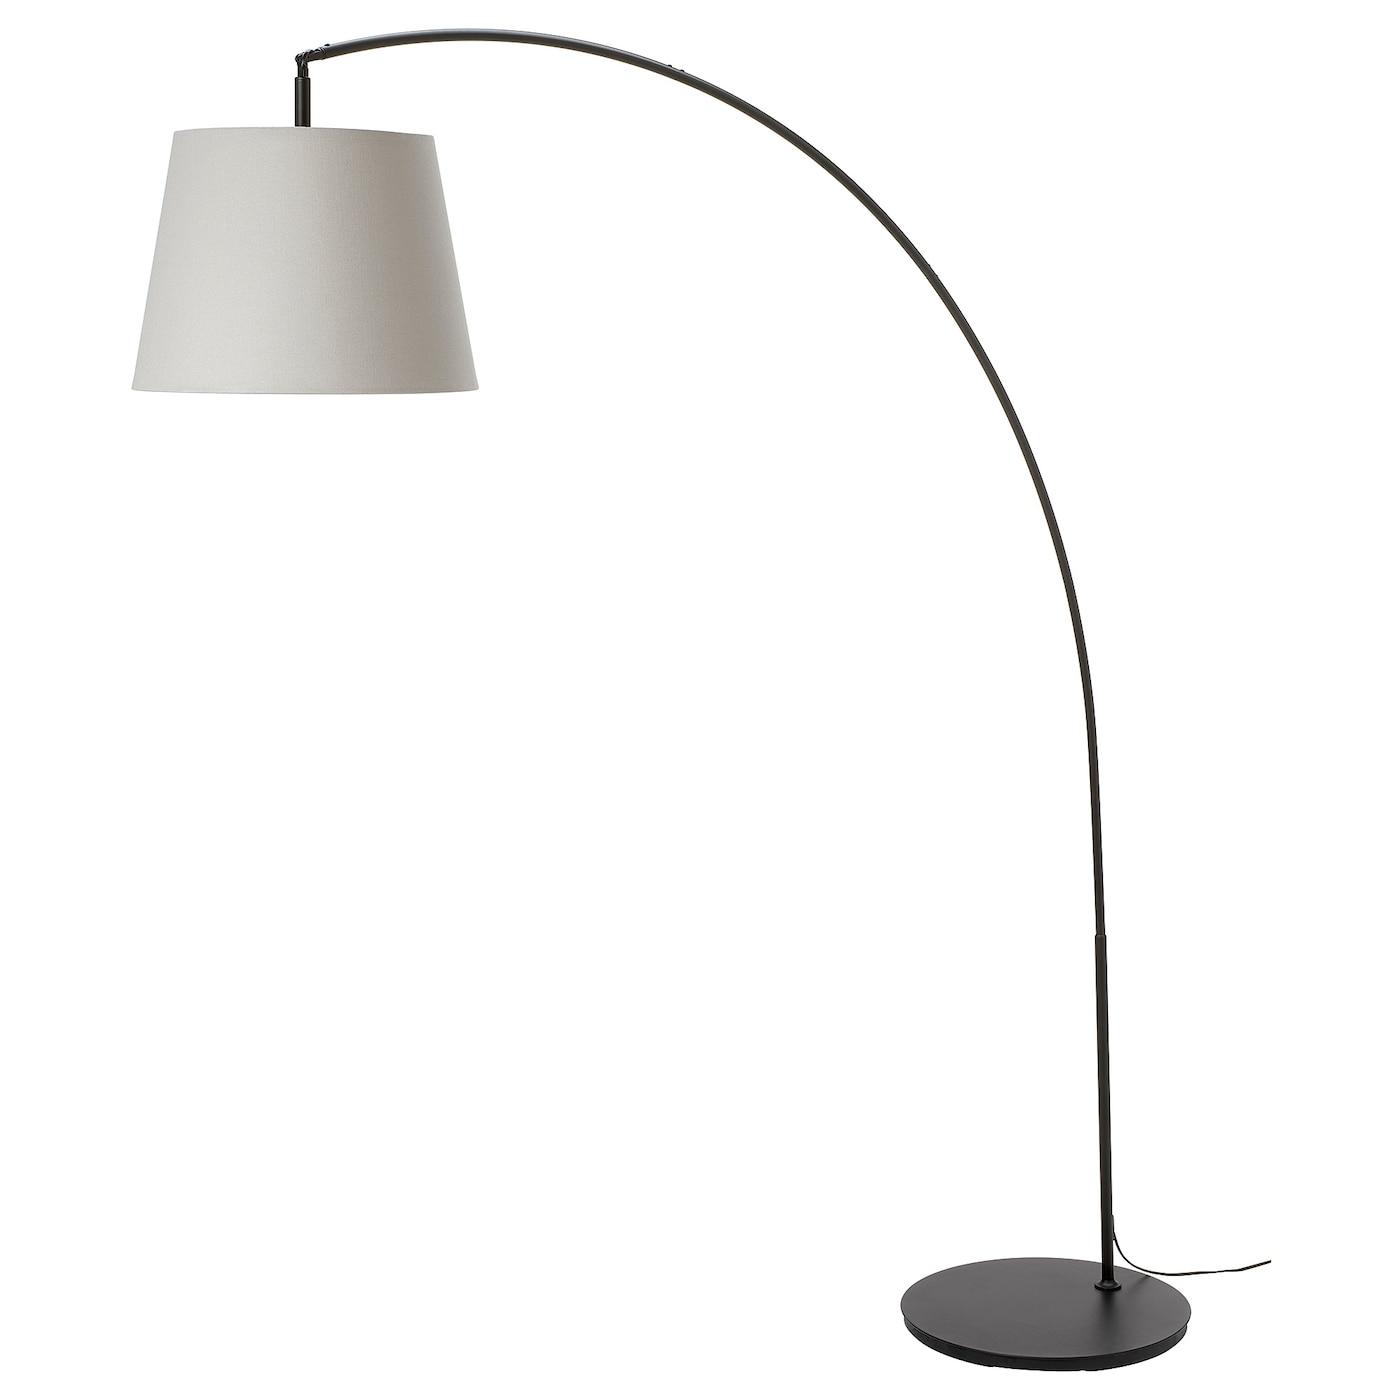 SKOTTORP / SKAFTET Floor lamp, arched - light grey - IKEA